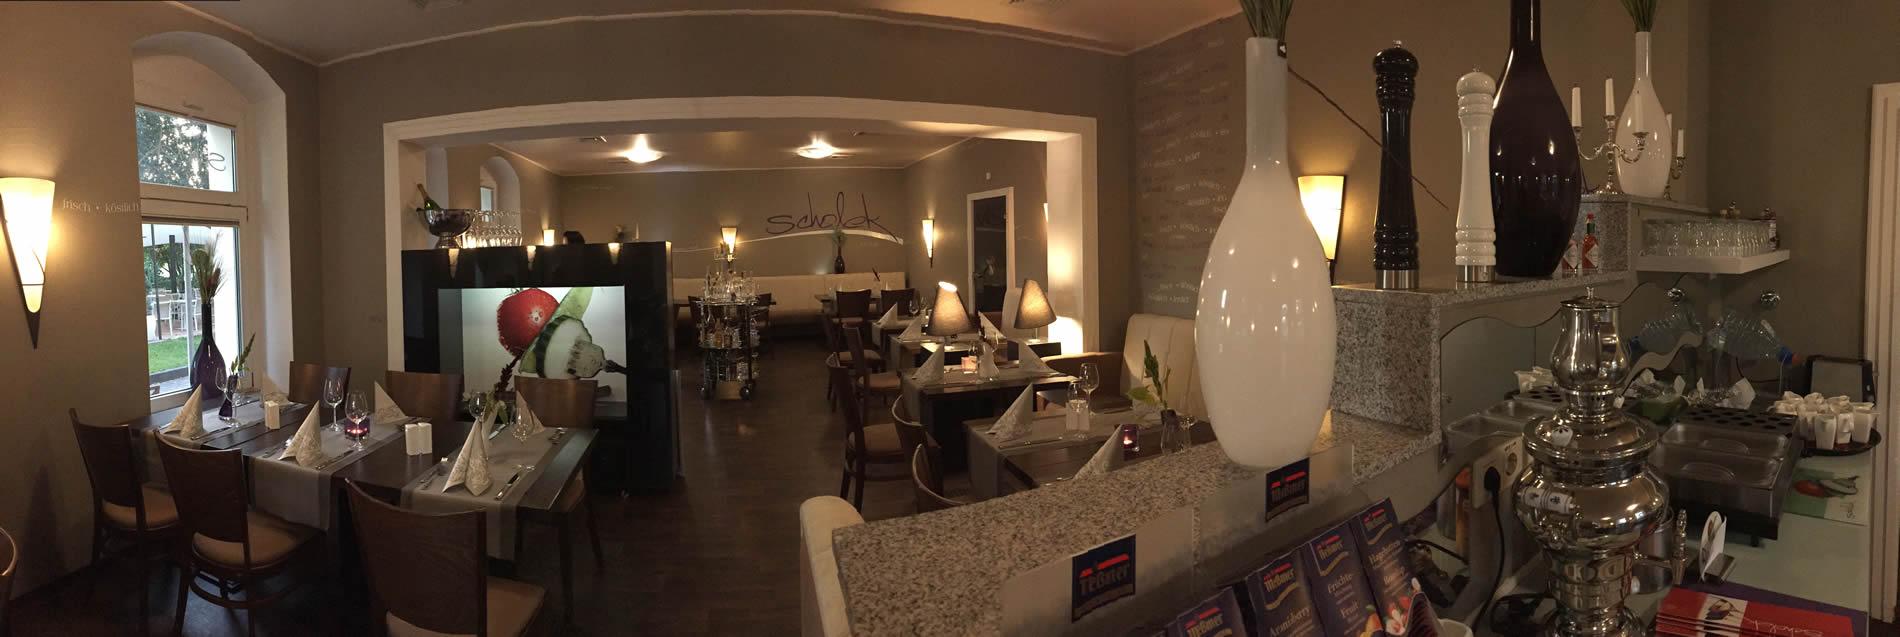 Scholek - Restaurant im Hotel Dresdner Hof